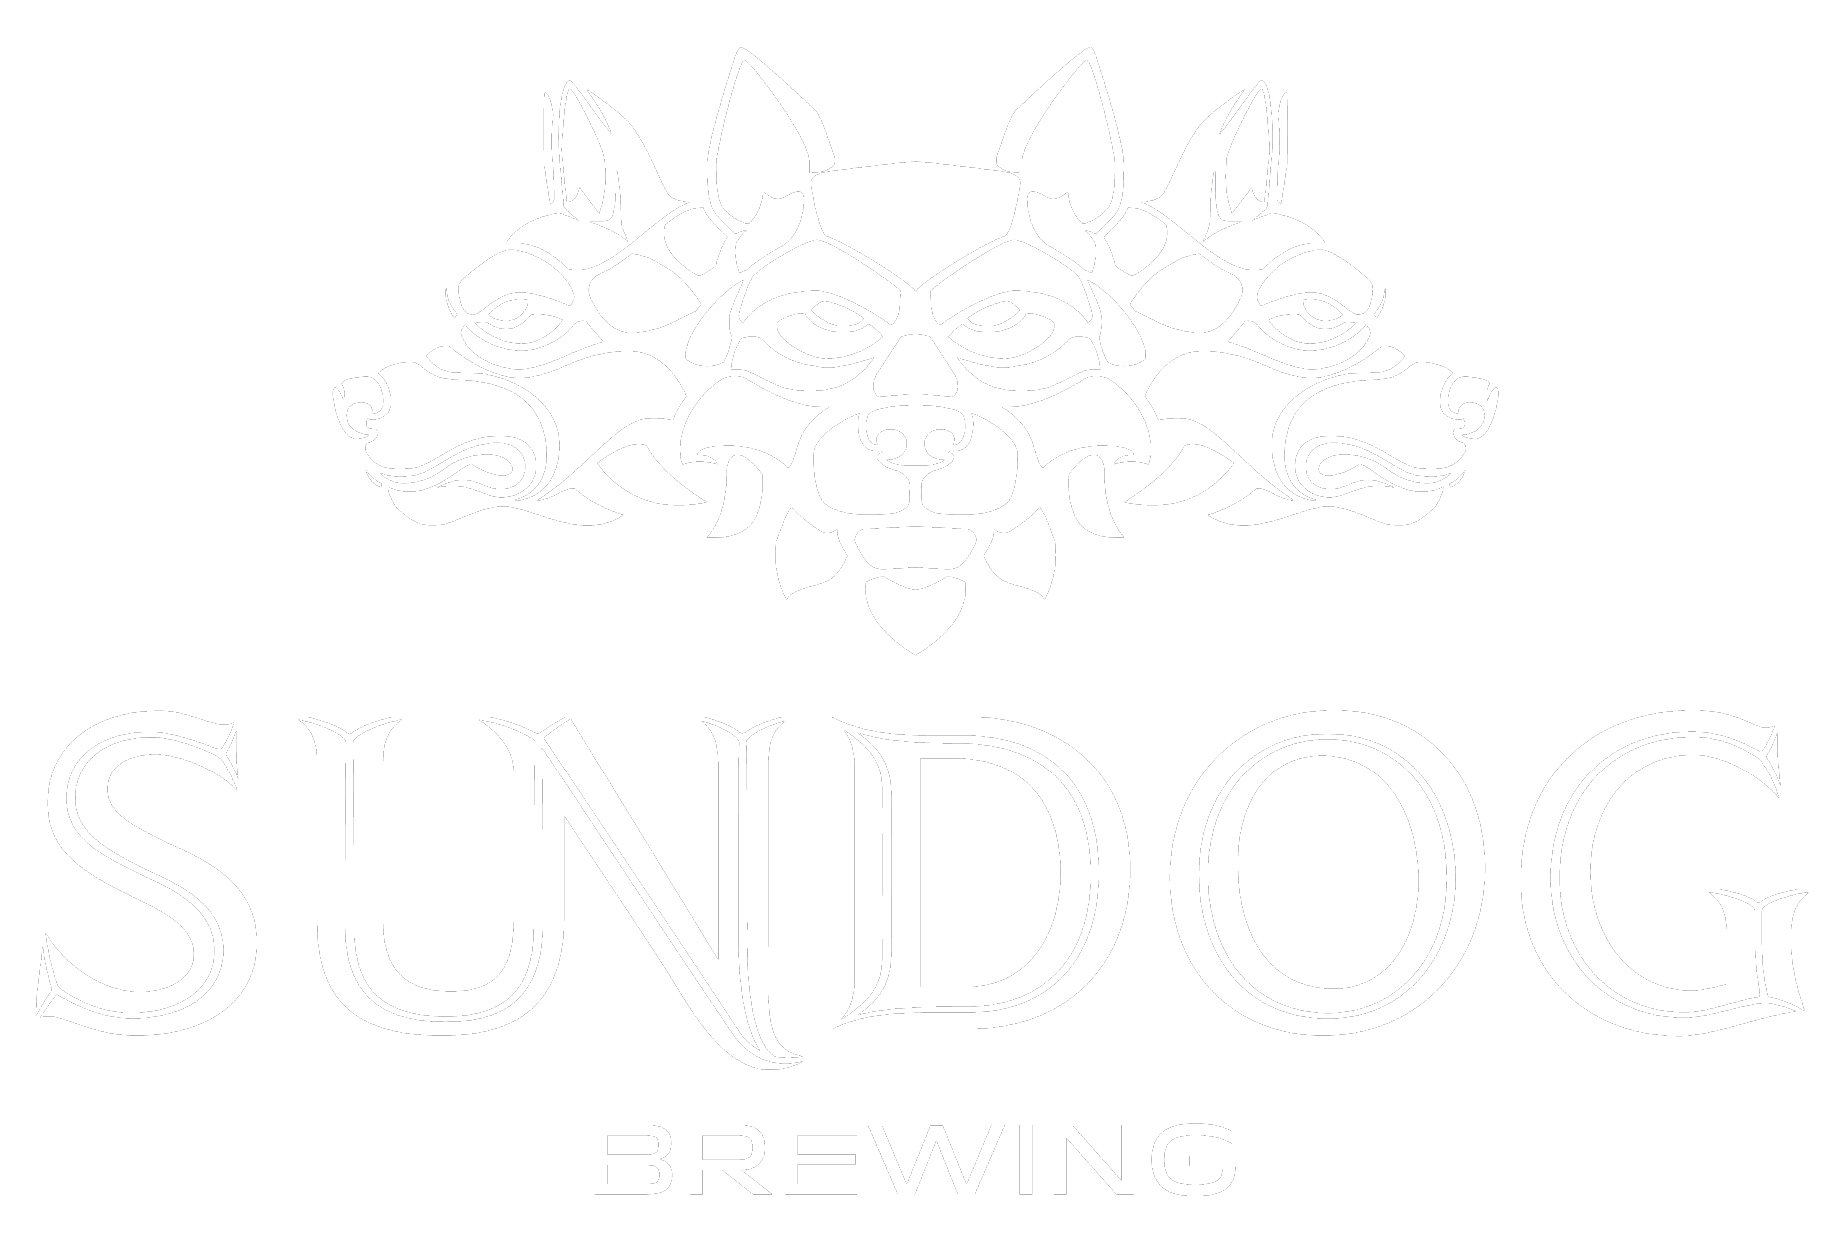 Sundog Brewing